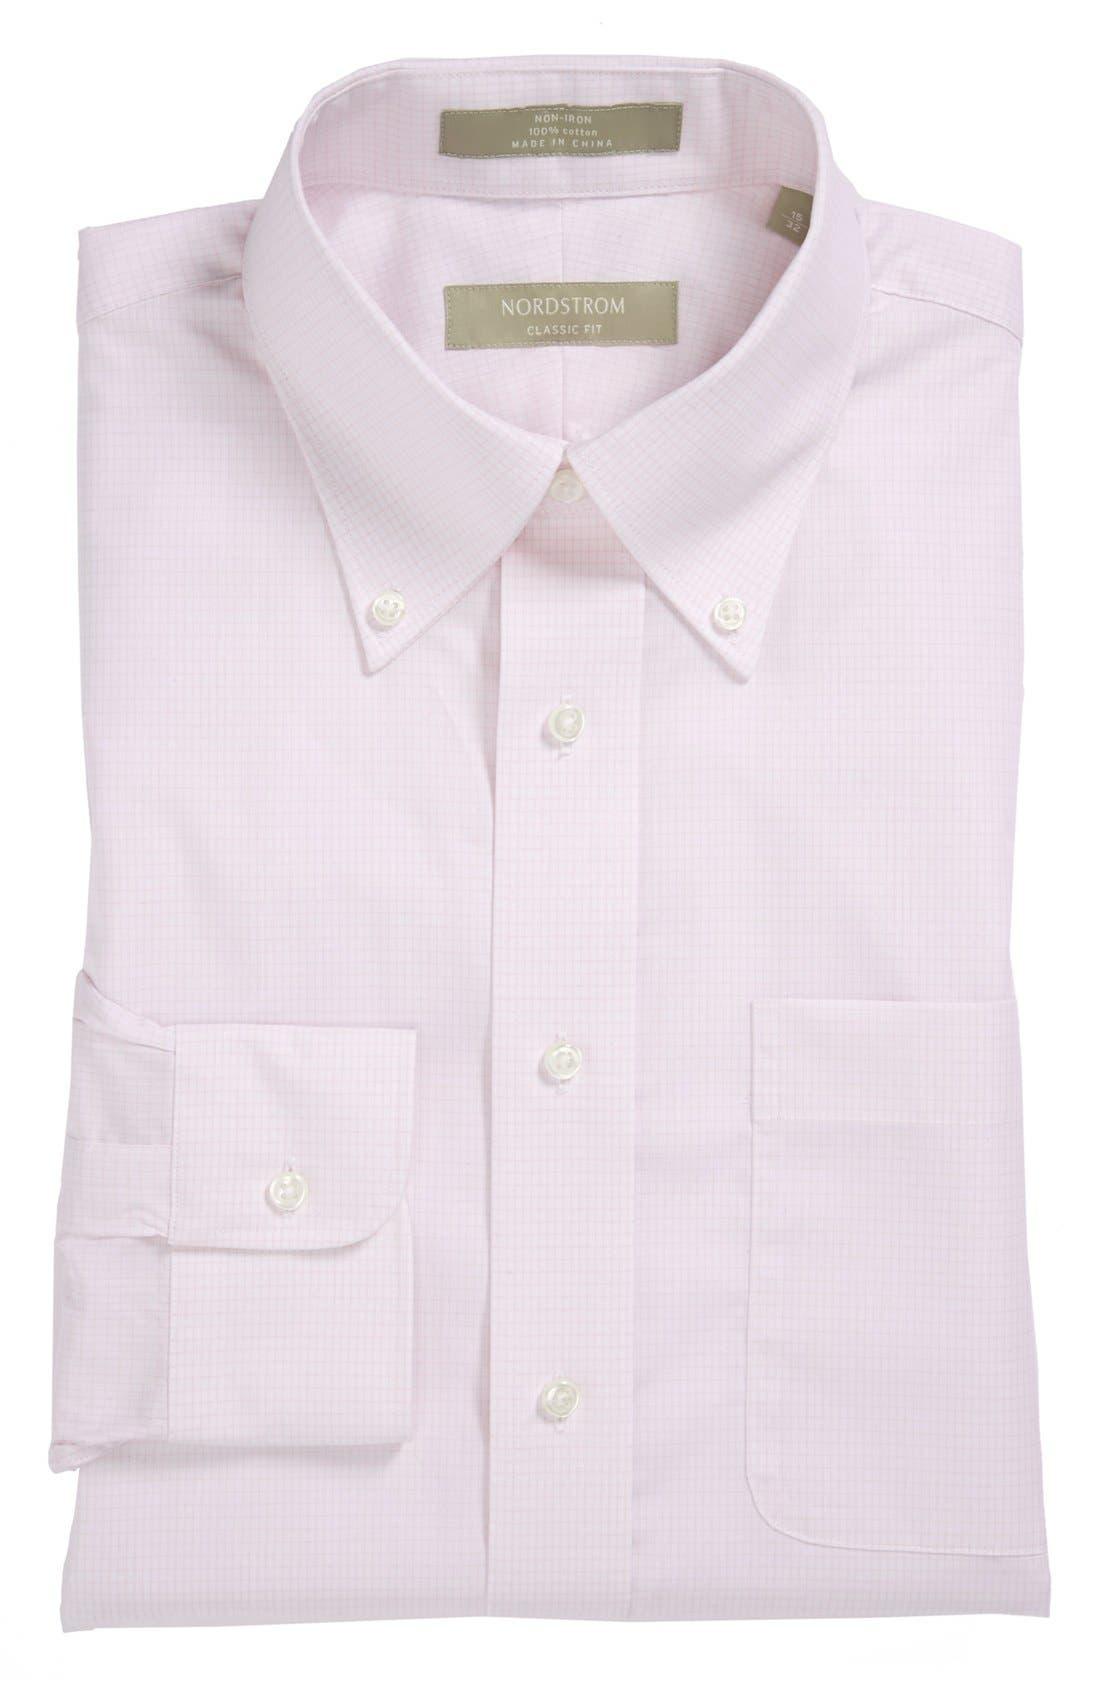 Main Image - Nordstrom Classic Fit Non-Iron Dress Shirt (Big & Tall)